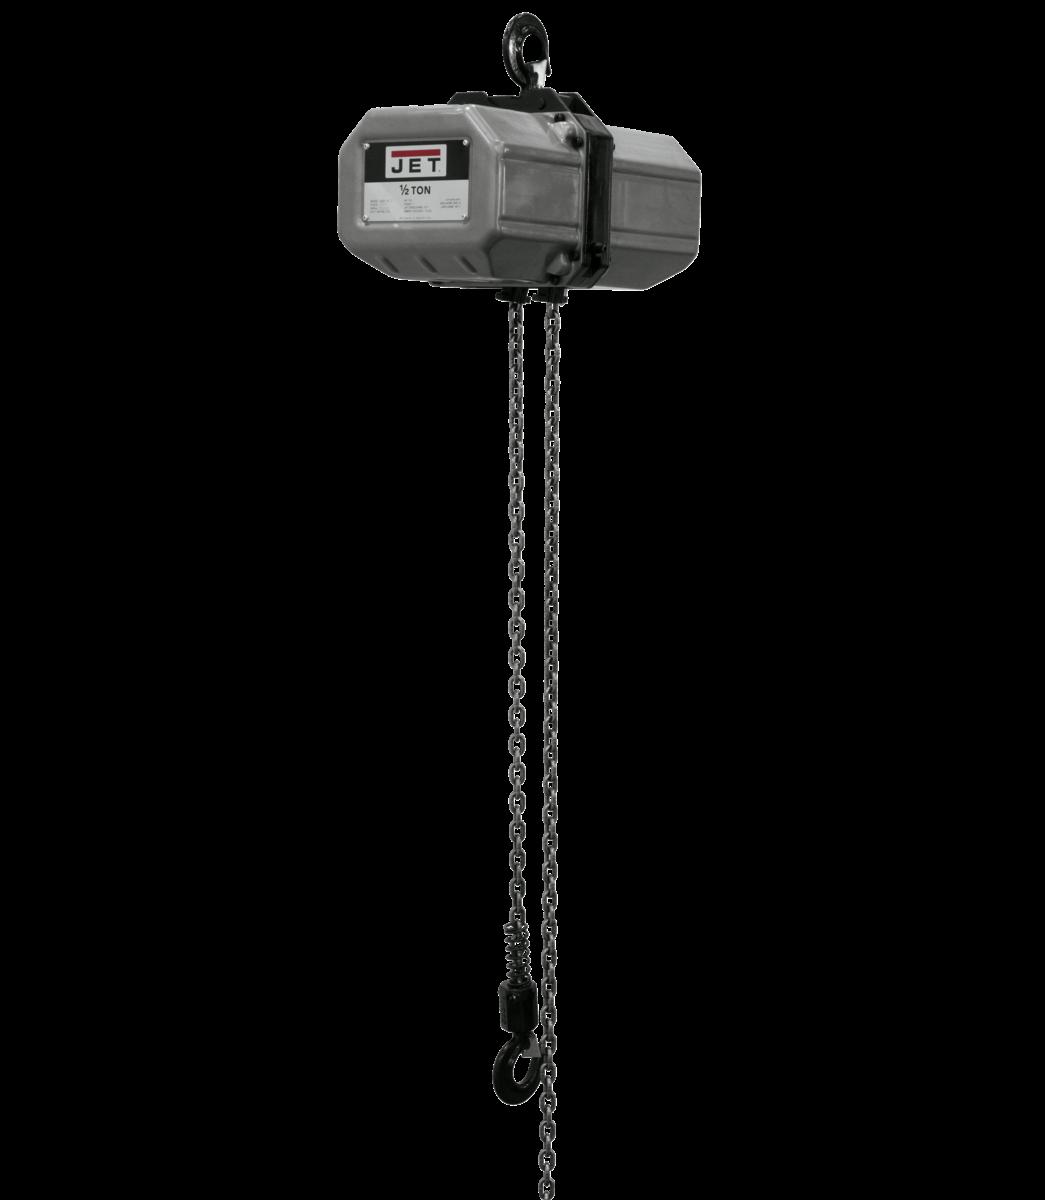 1/2SS-1C-20, 1/2-Ton Electric Chain Hoist 1-Phase 20' Lift